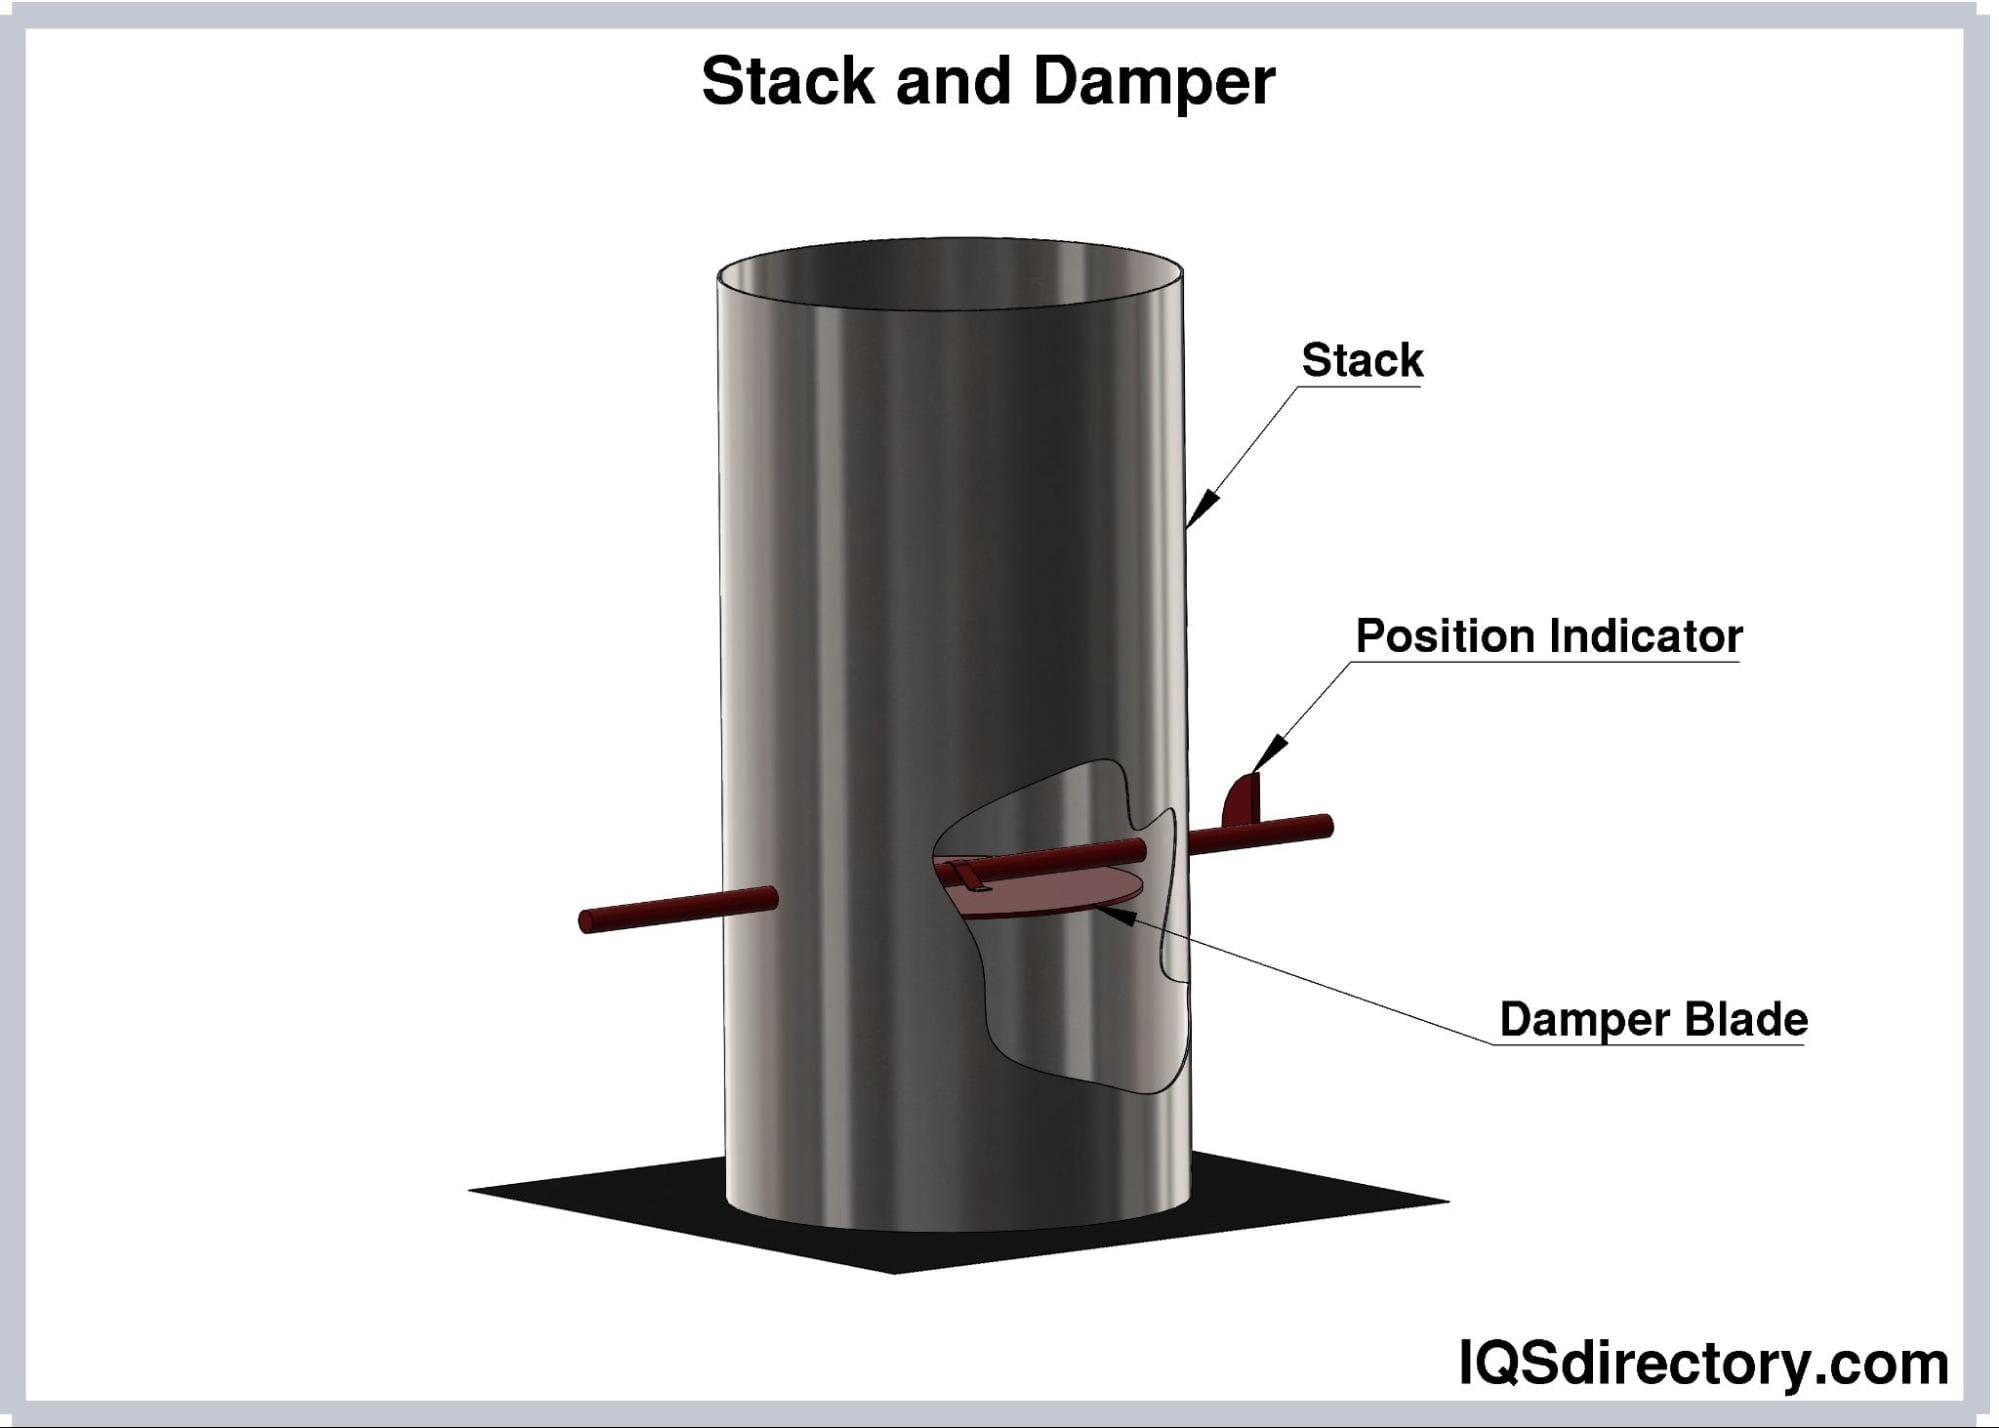 Stack and Damper